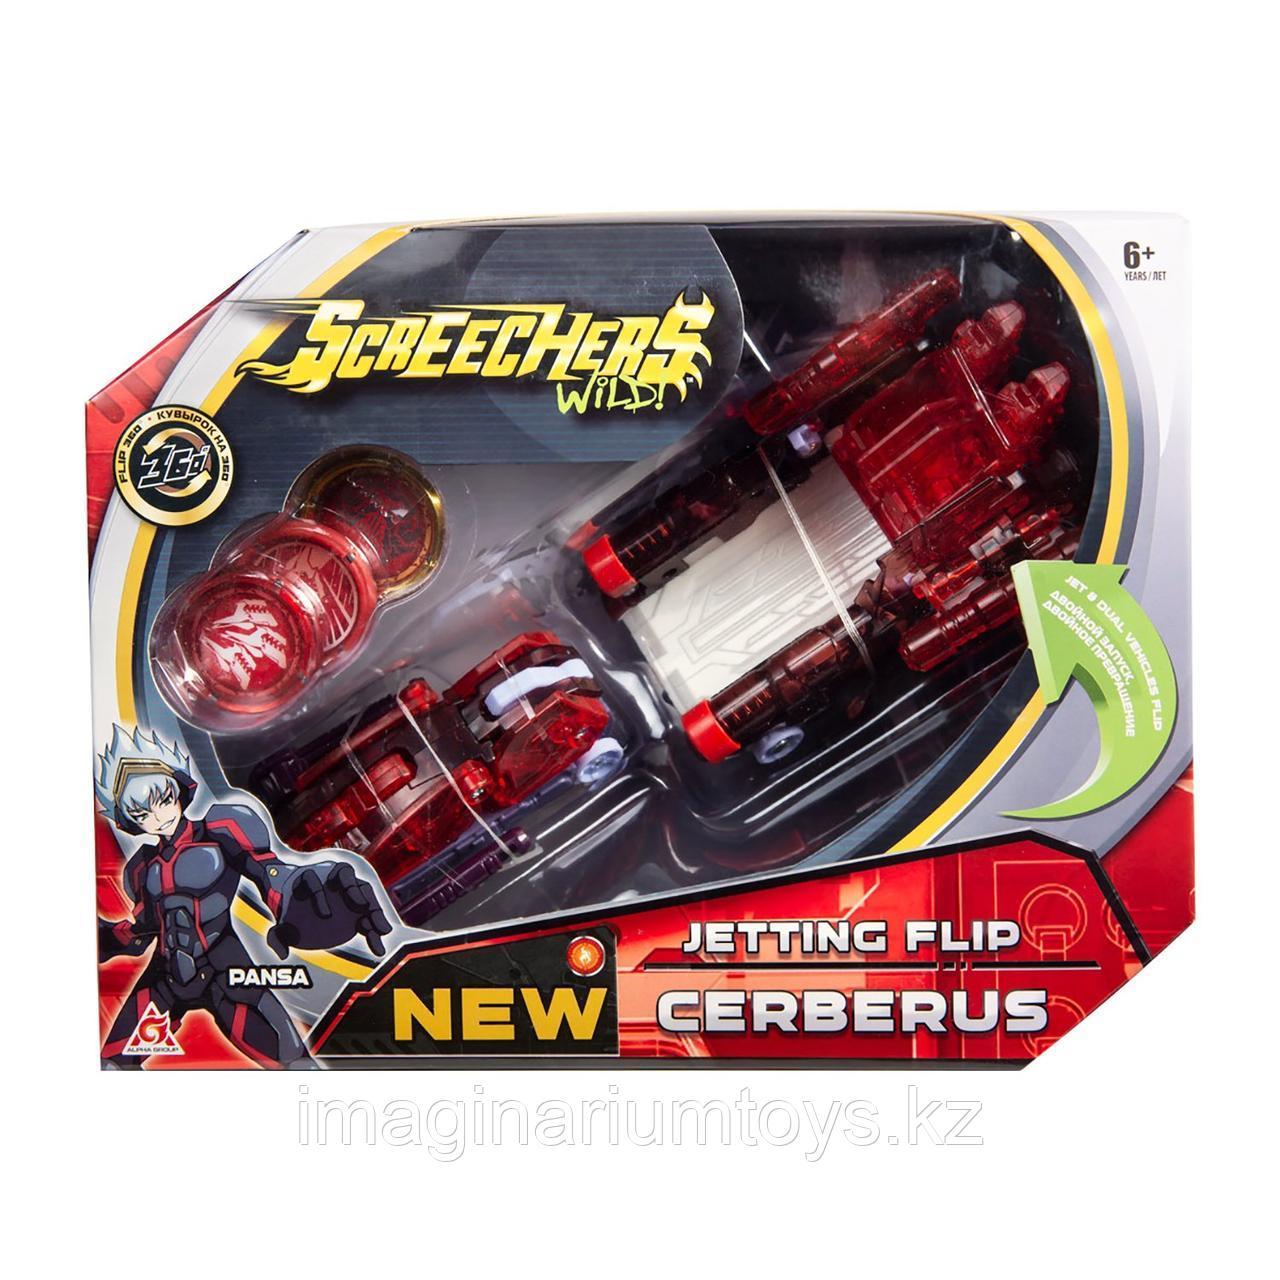 Screechers Wild Машинка-трансформер Турбо Скричер 2 в 1 Церберус